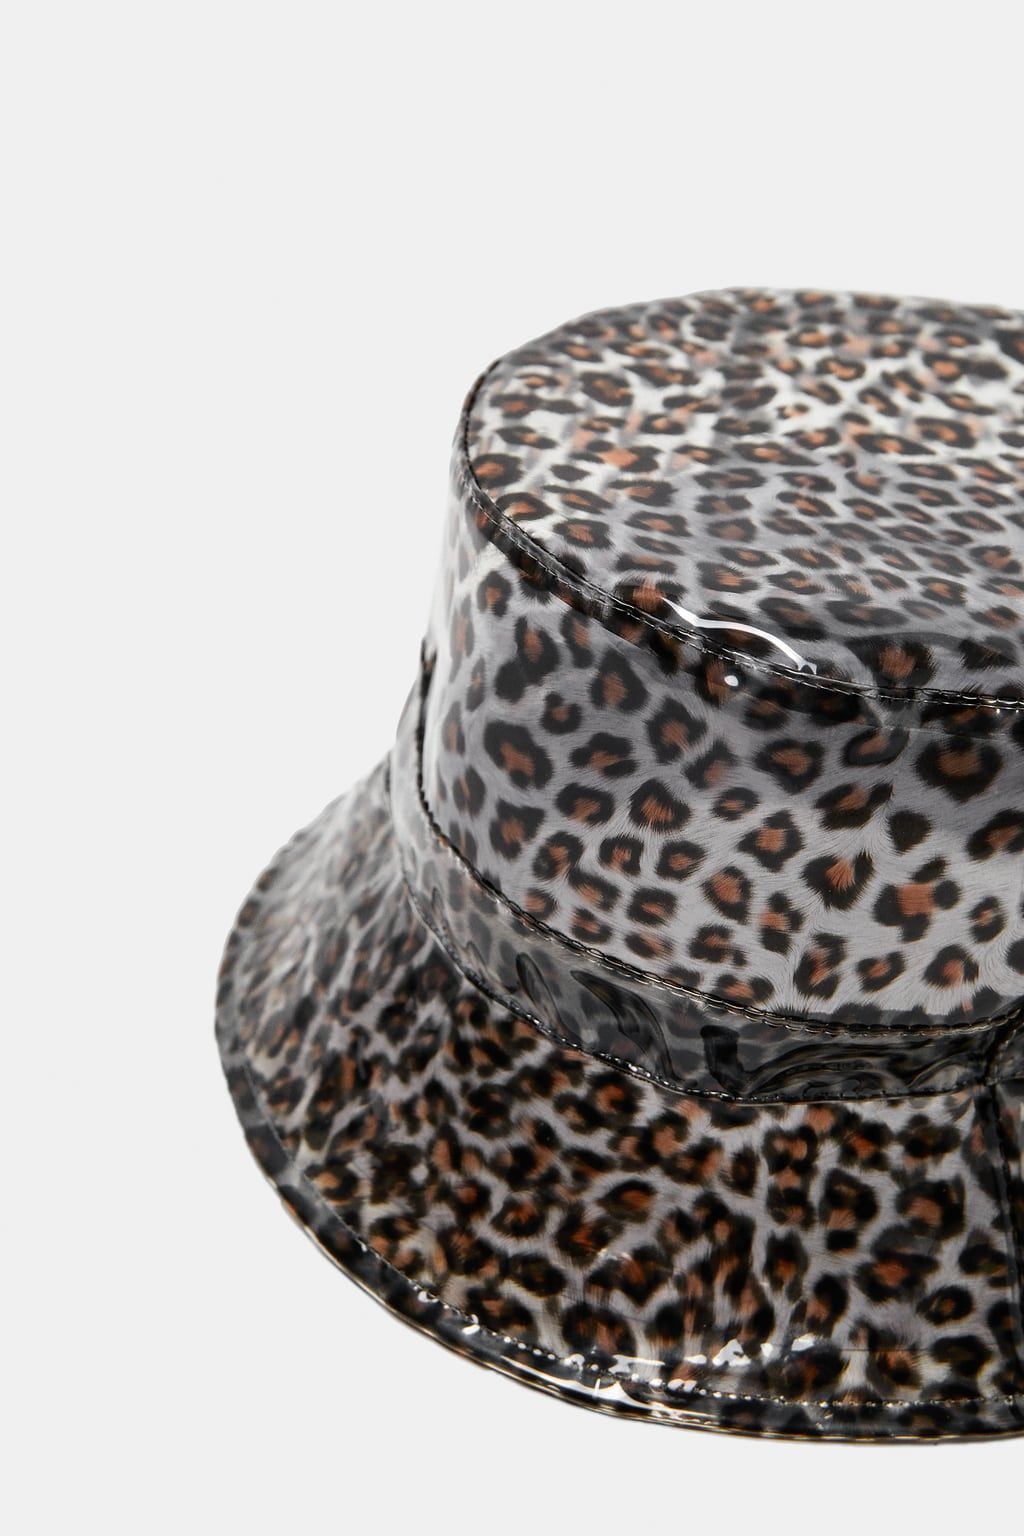 Image 3 Of Leopard Print Rain Hat From Zara Rain Hat Hats Leopard Print